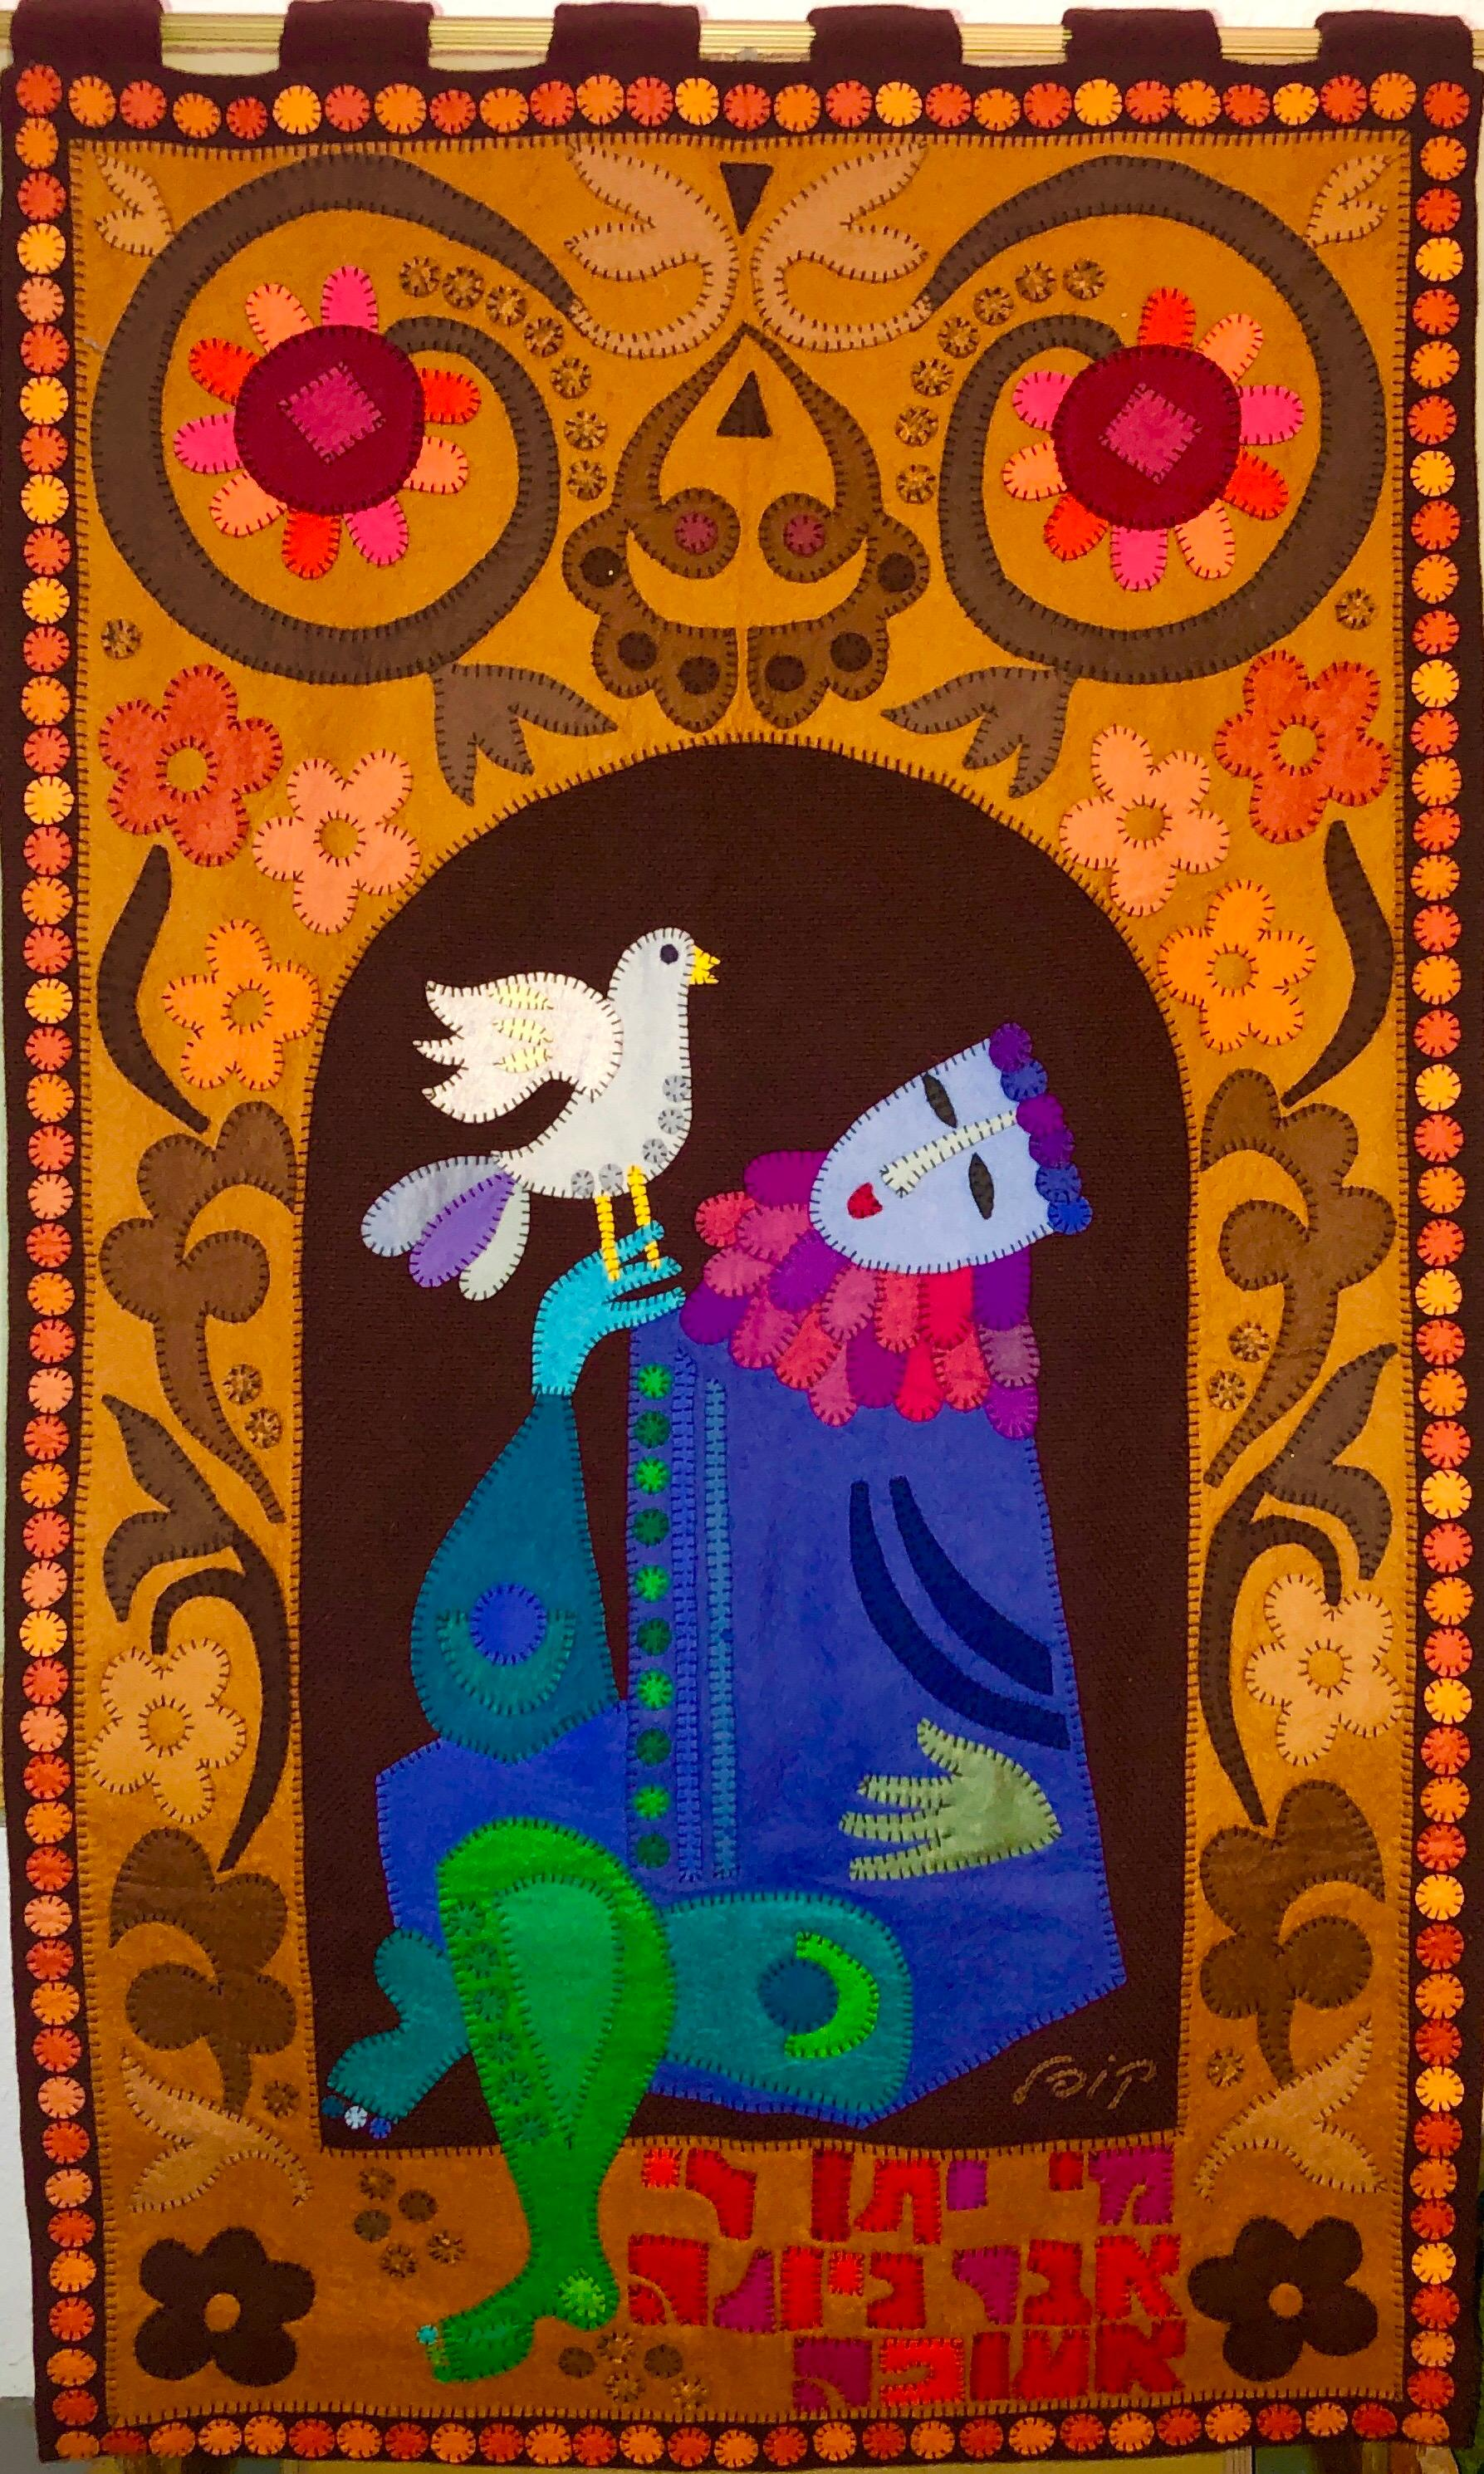 Wool Felt Applique Original Vintage Israeli Judaica Folk Art Signed Tapestry